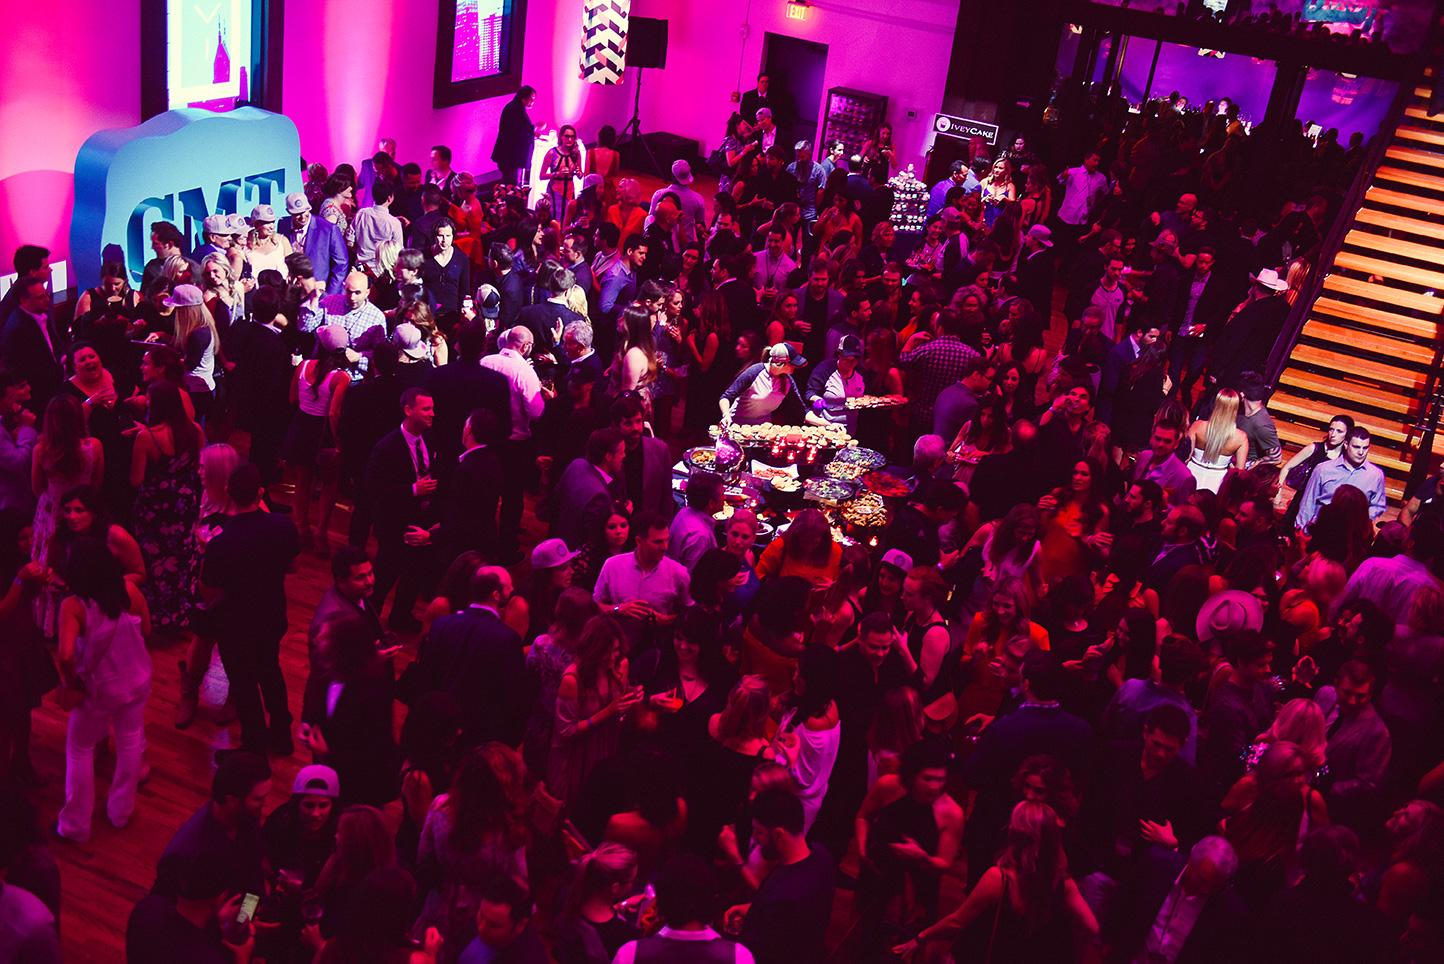 CMT-Party-Event-Crowd